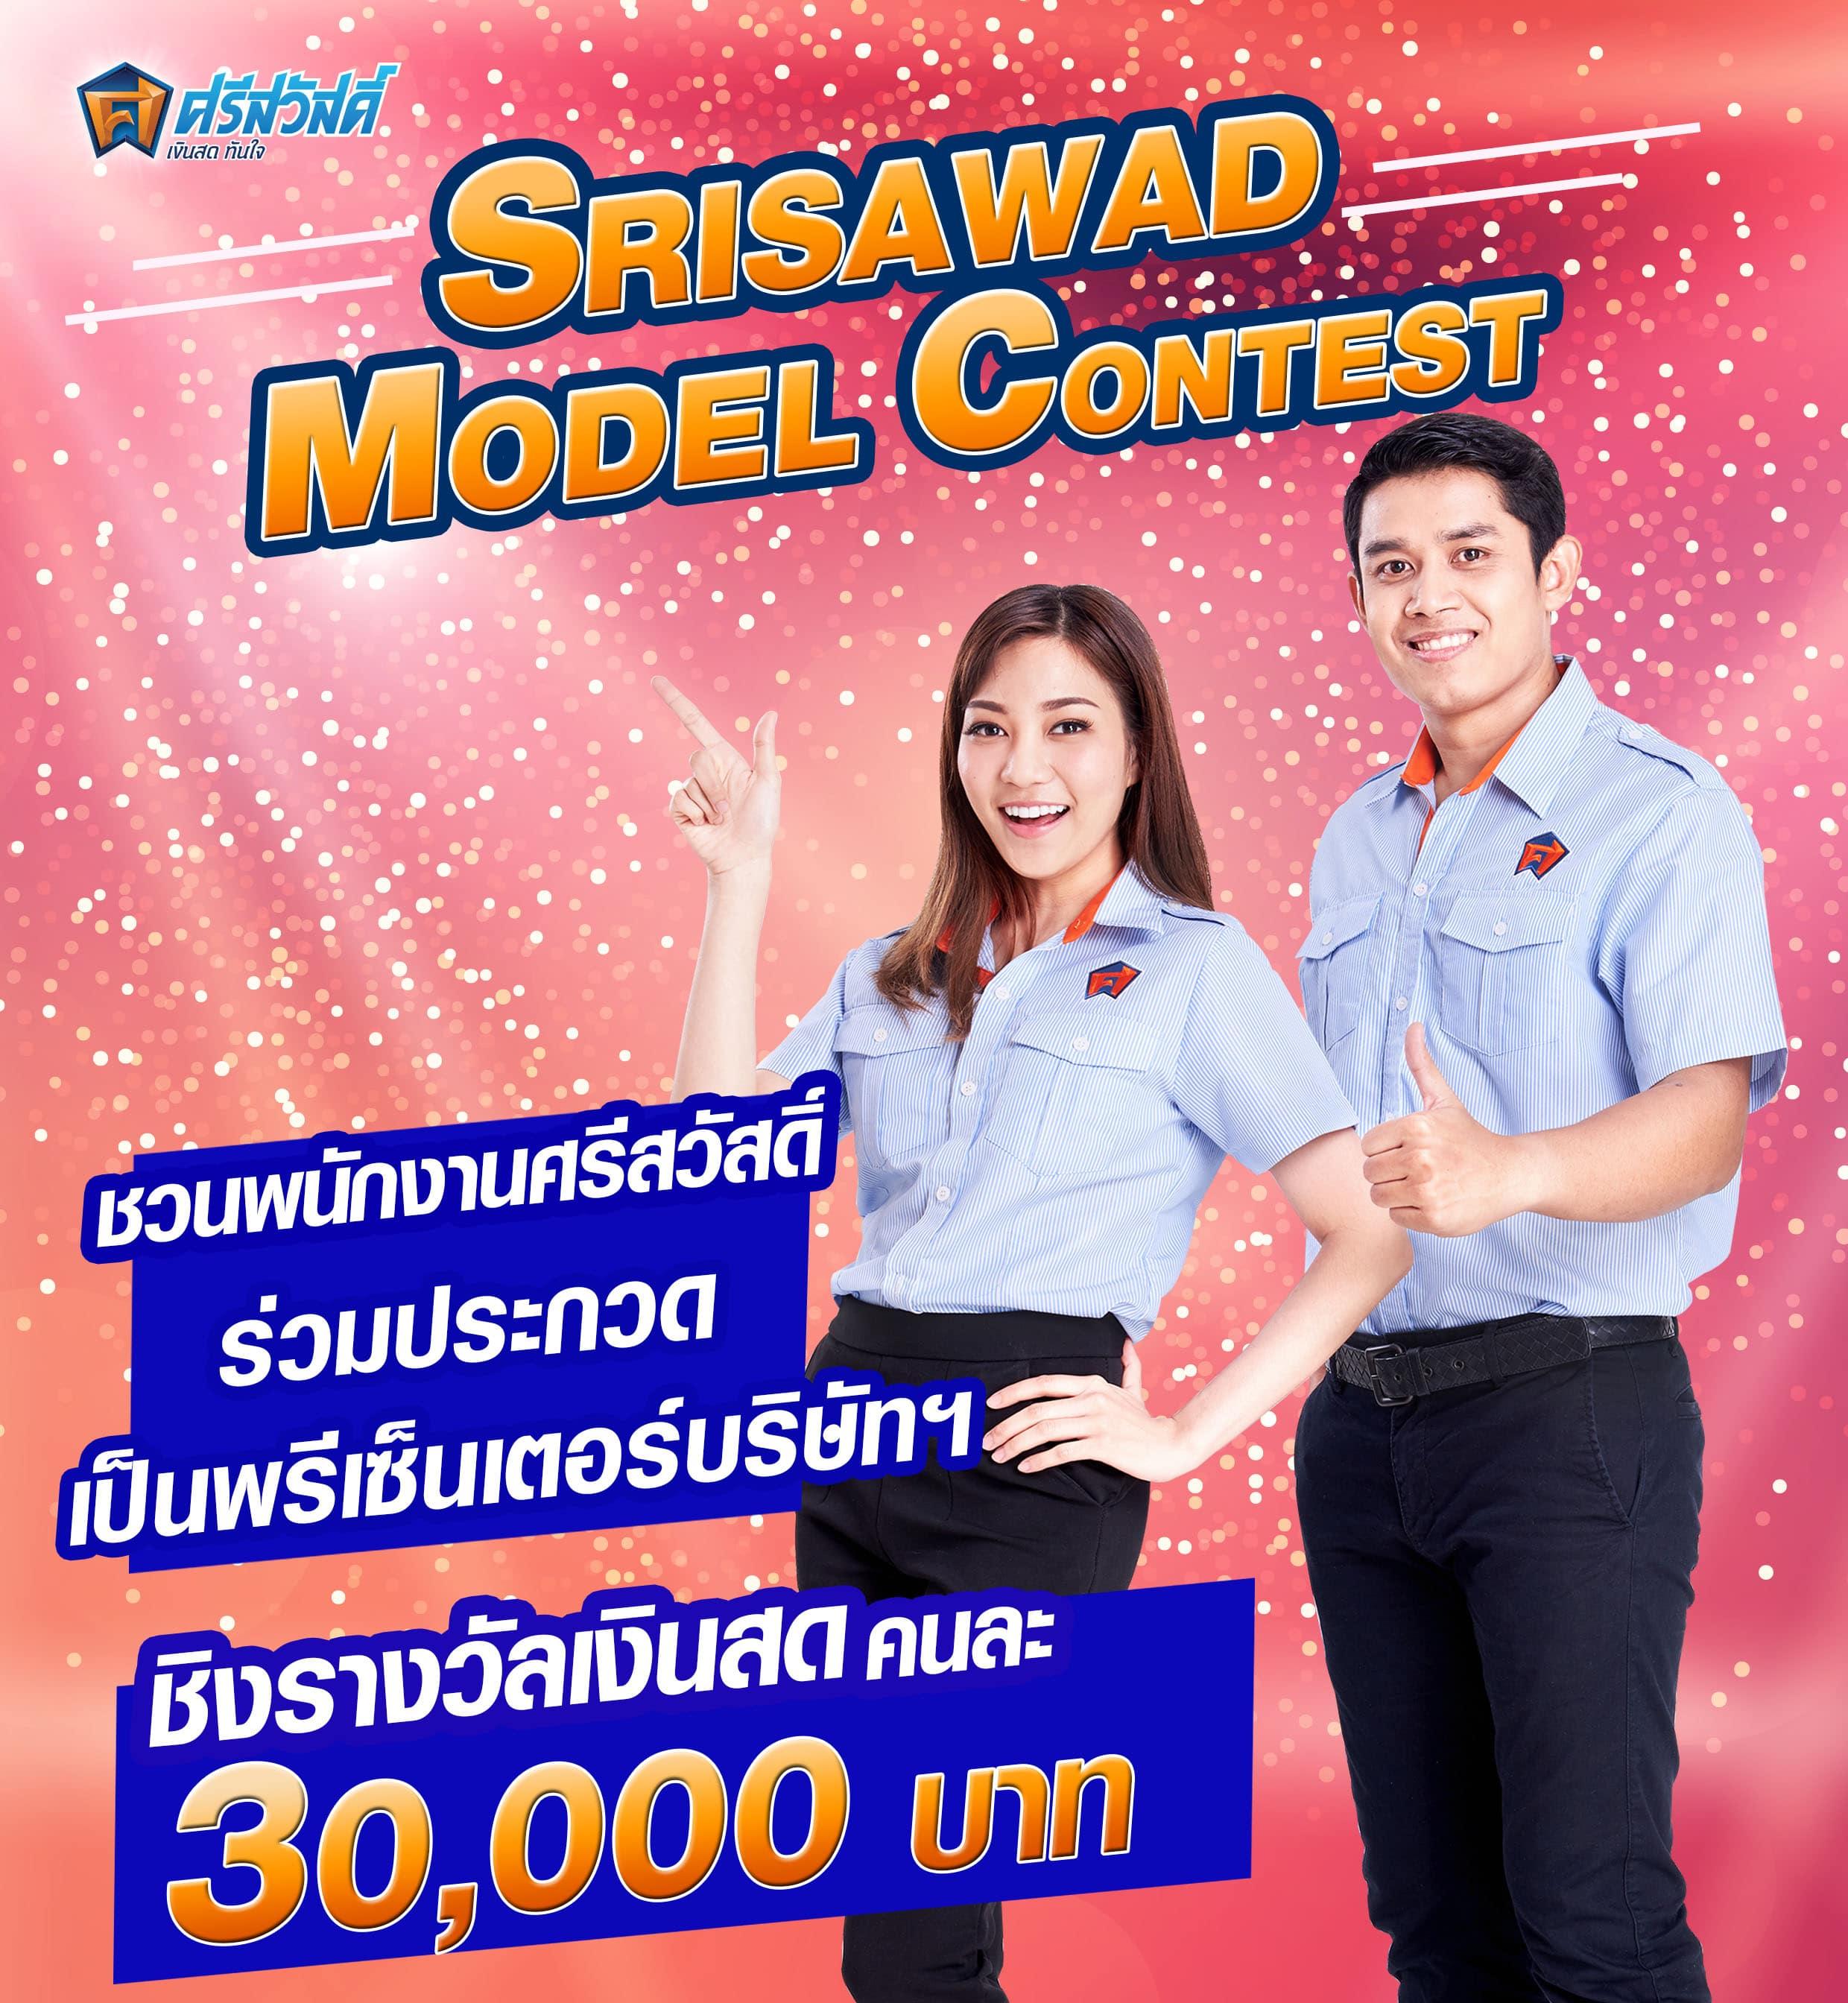 srisawad model contest ชวนพนักงานศรีสวัสดิ์ ร่วมประกวด พรีเซ็นเตอร์บริษัทฯ